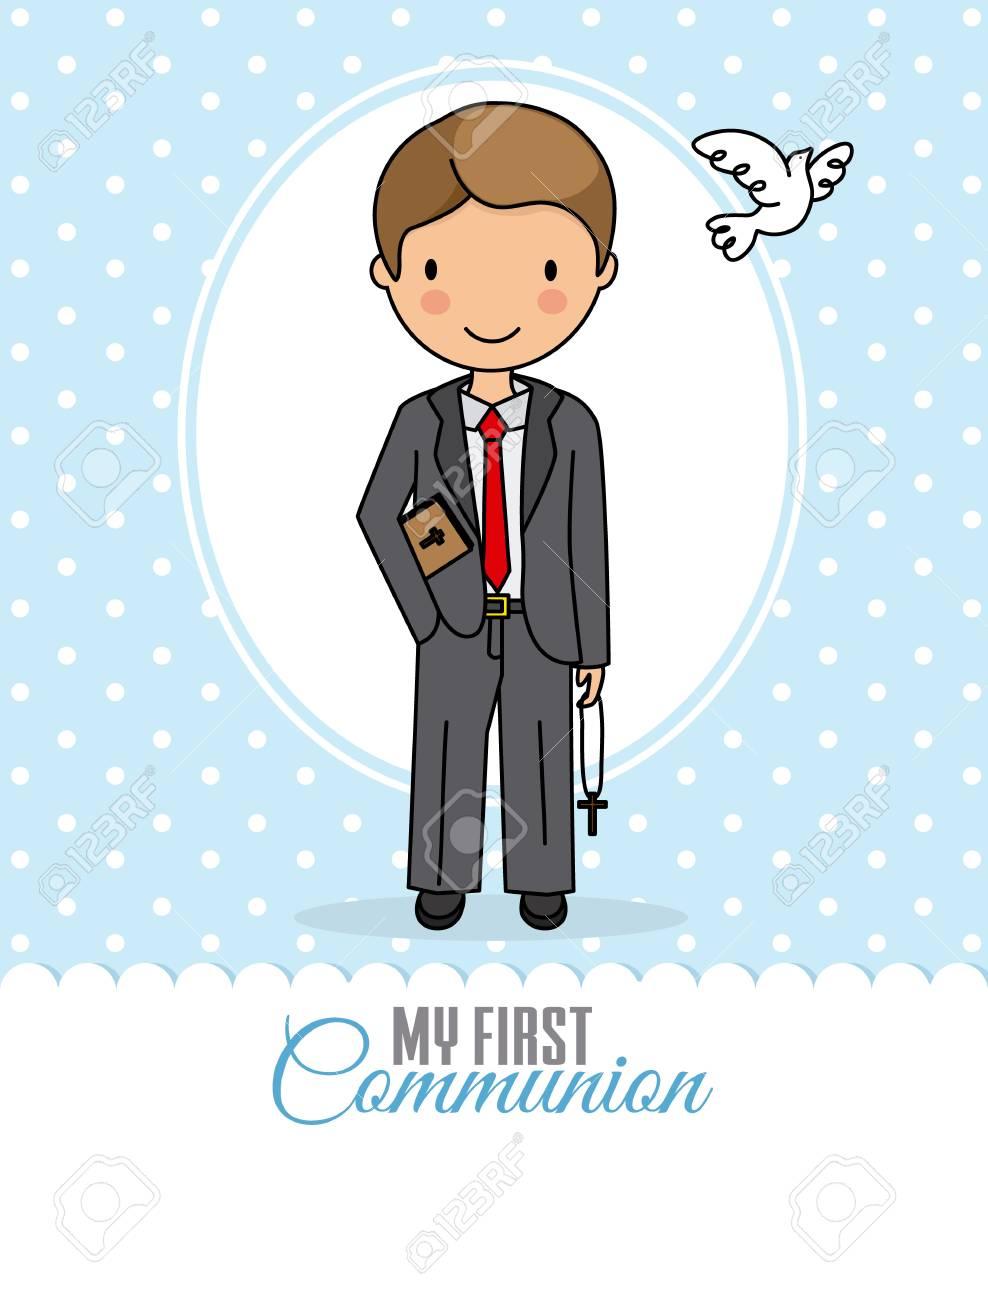 my first communion boy - 112642206